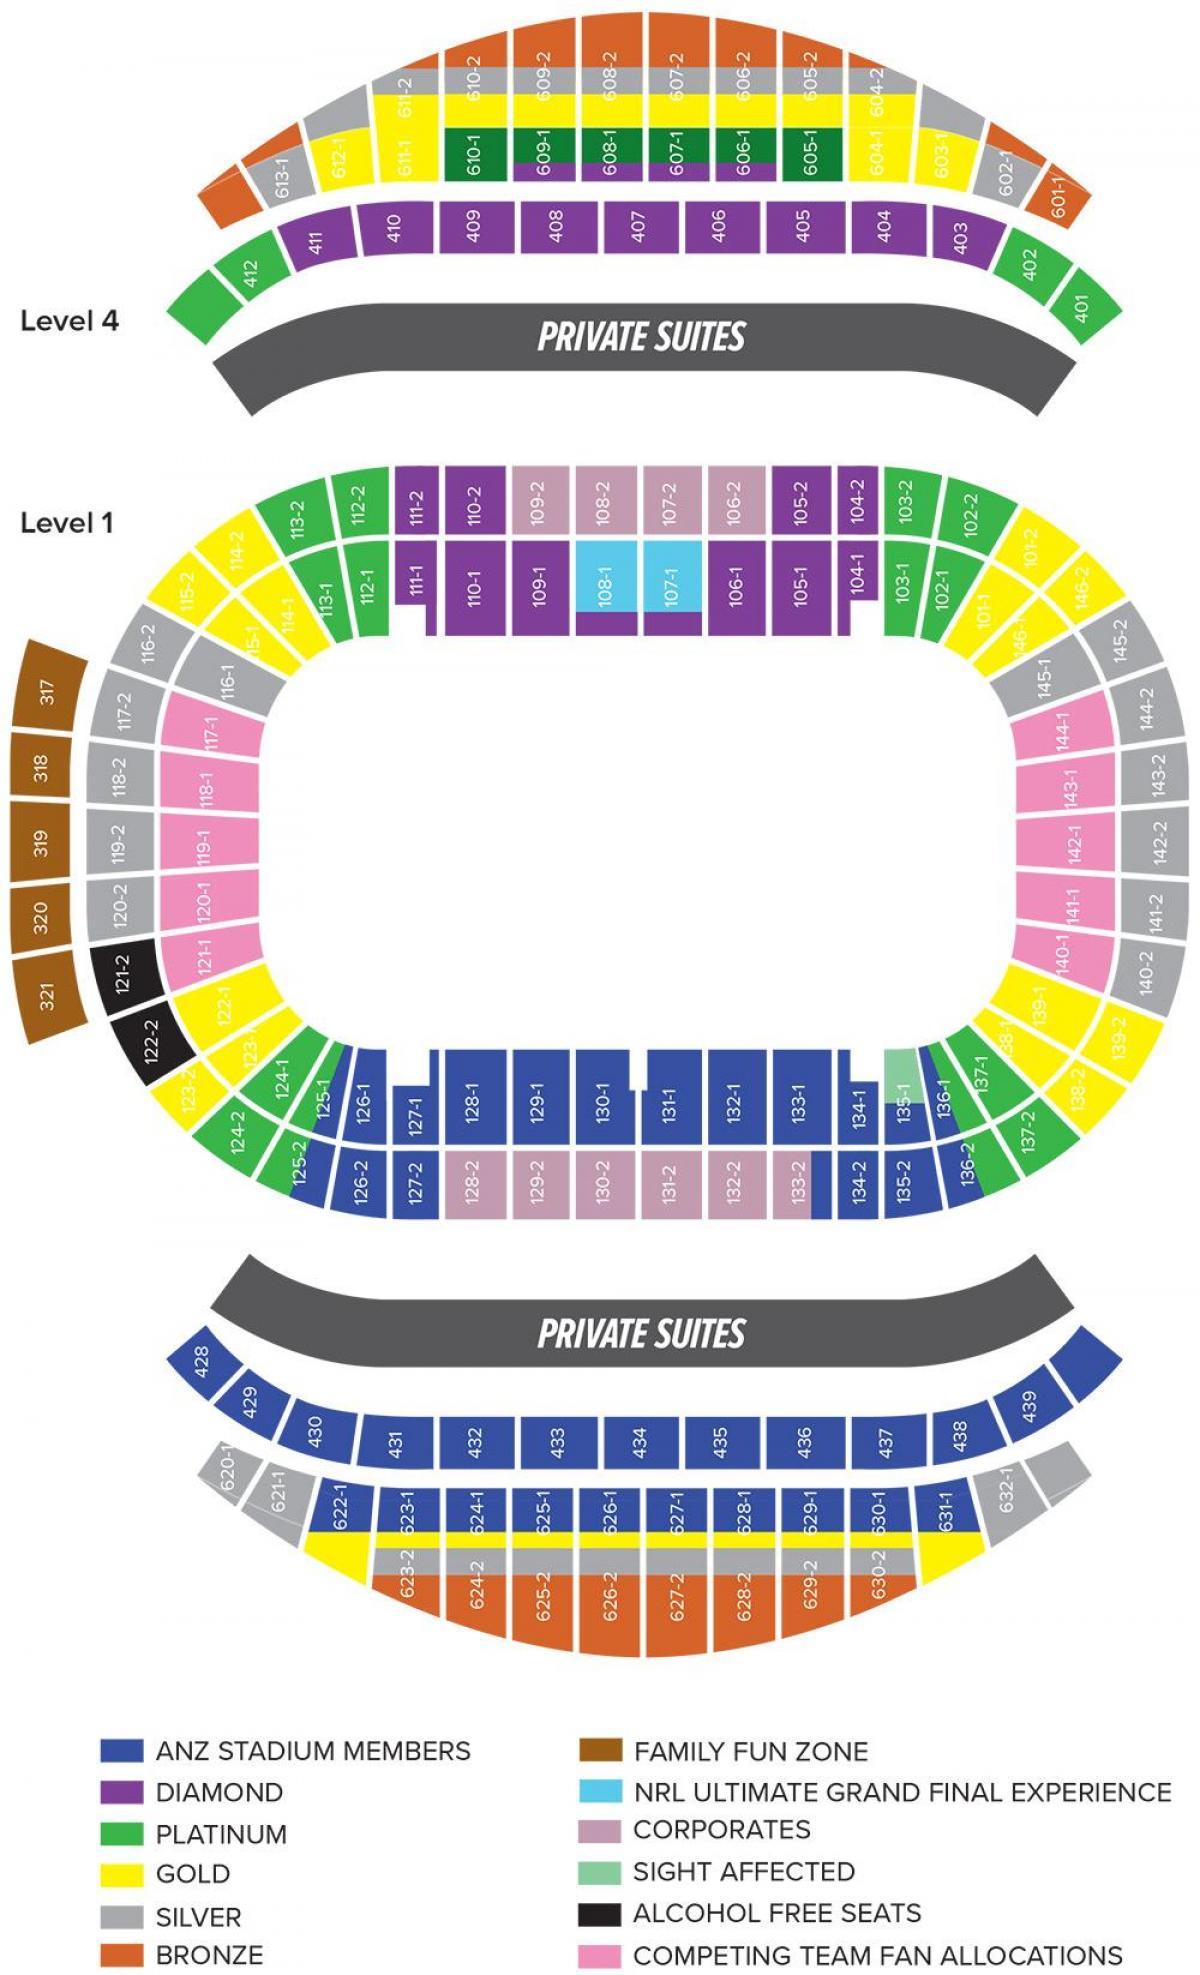 Anz Stadium Map Anz stadium map   Anz seating map (Australia) Anz Stadium Map